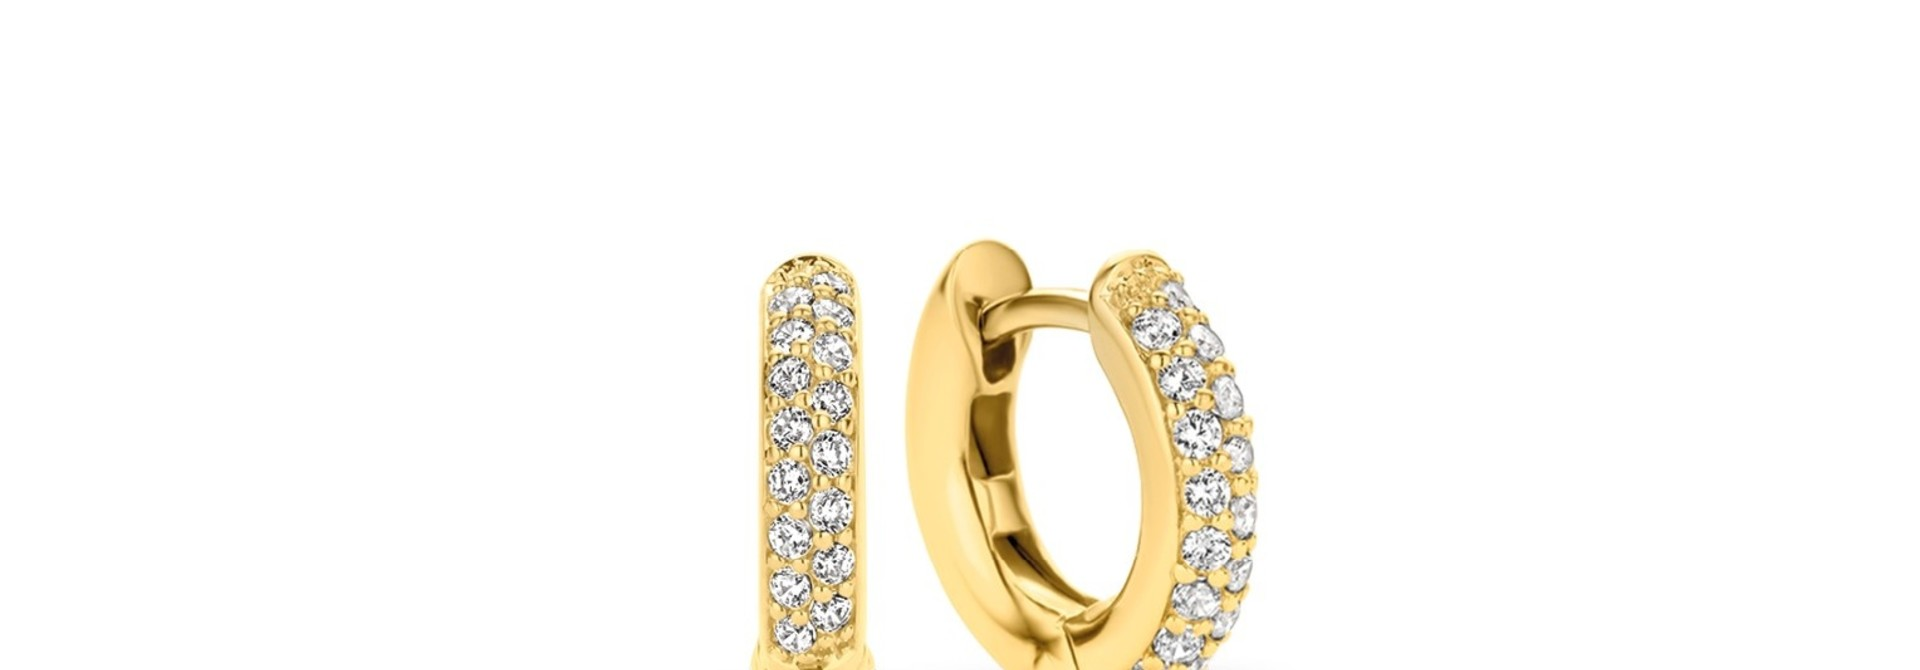 TI SENTO - Milano Earrings 7210ZY